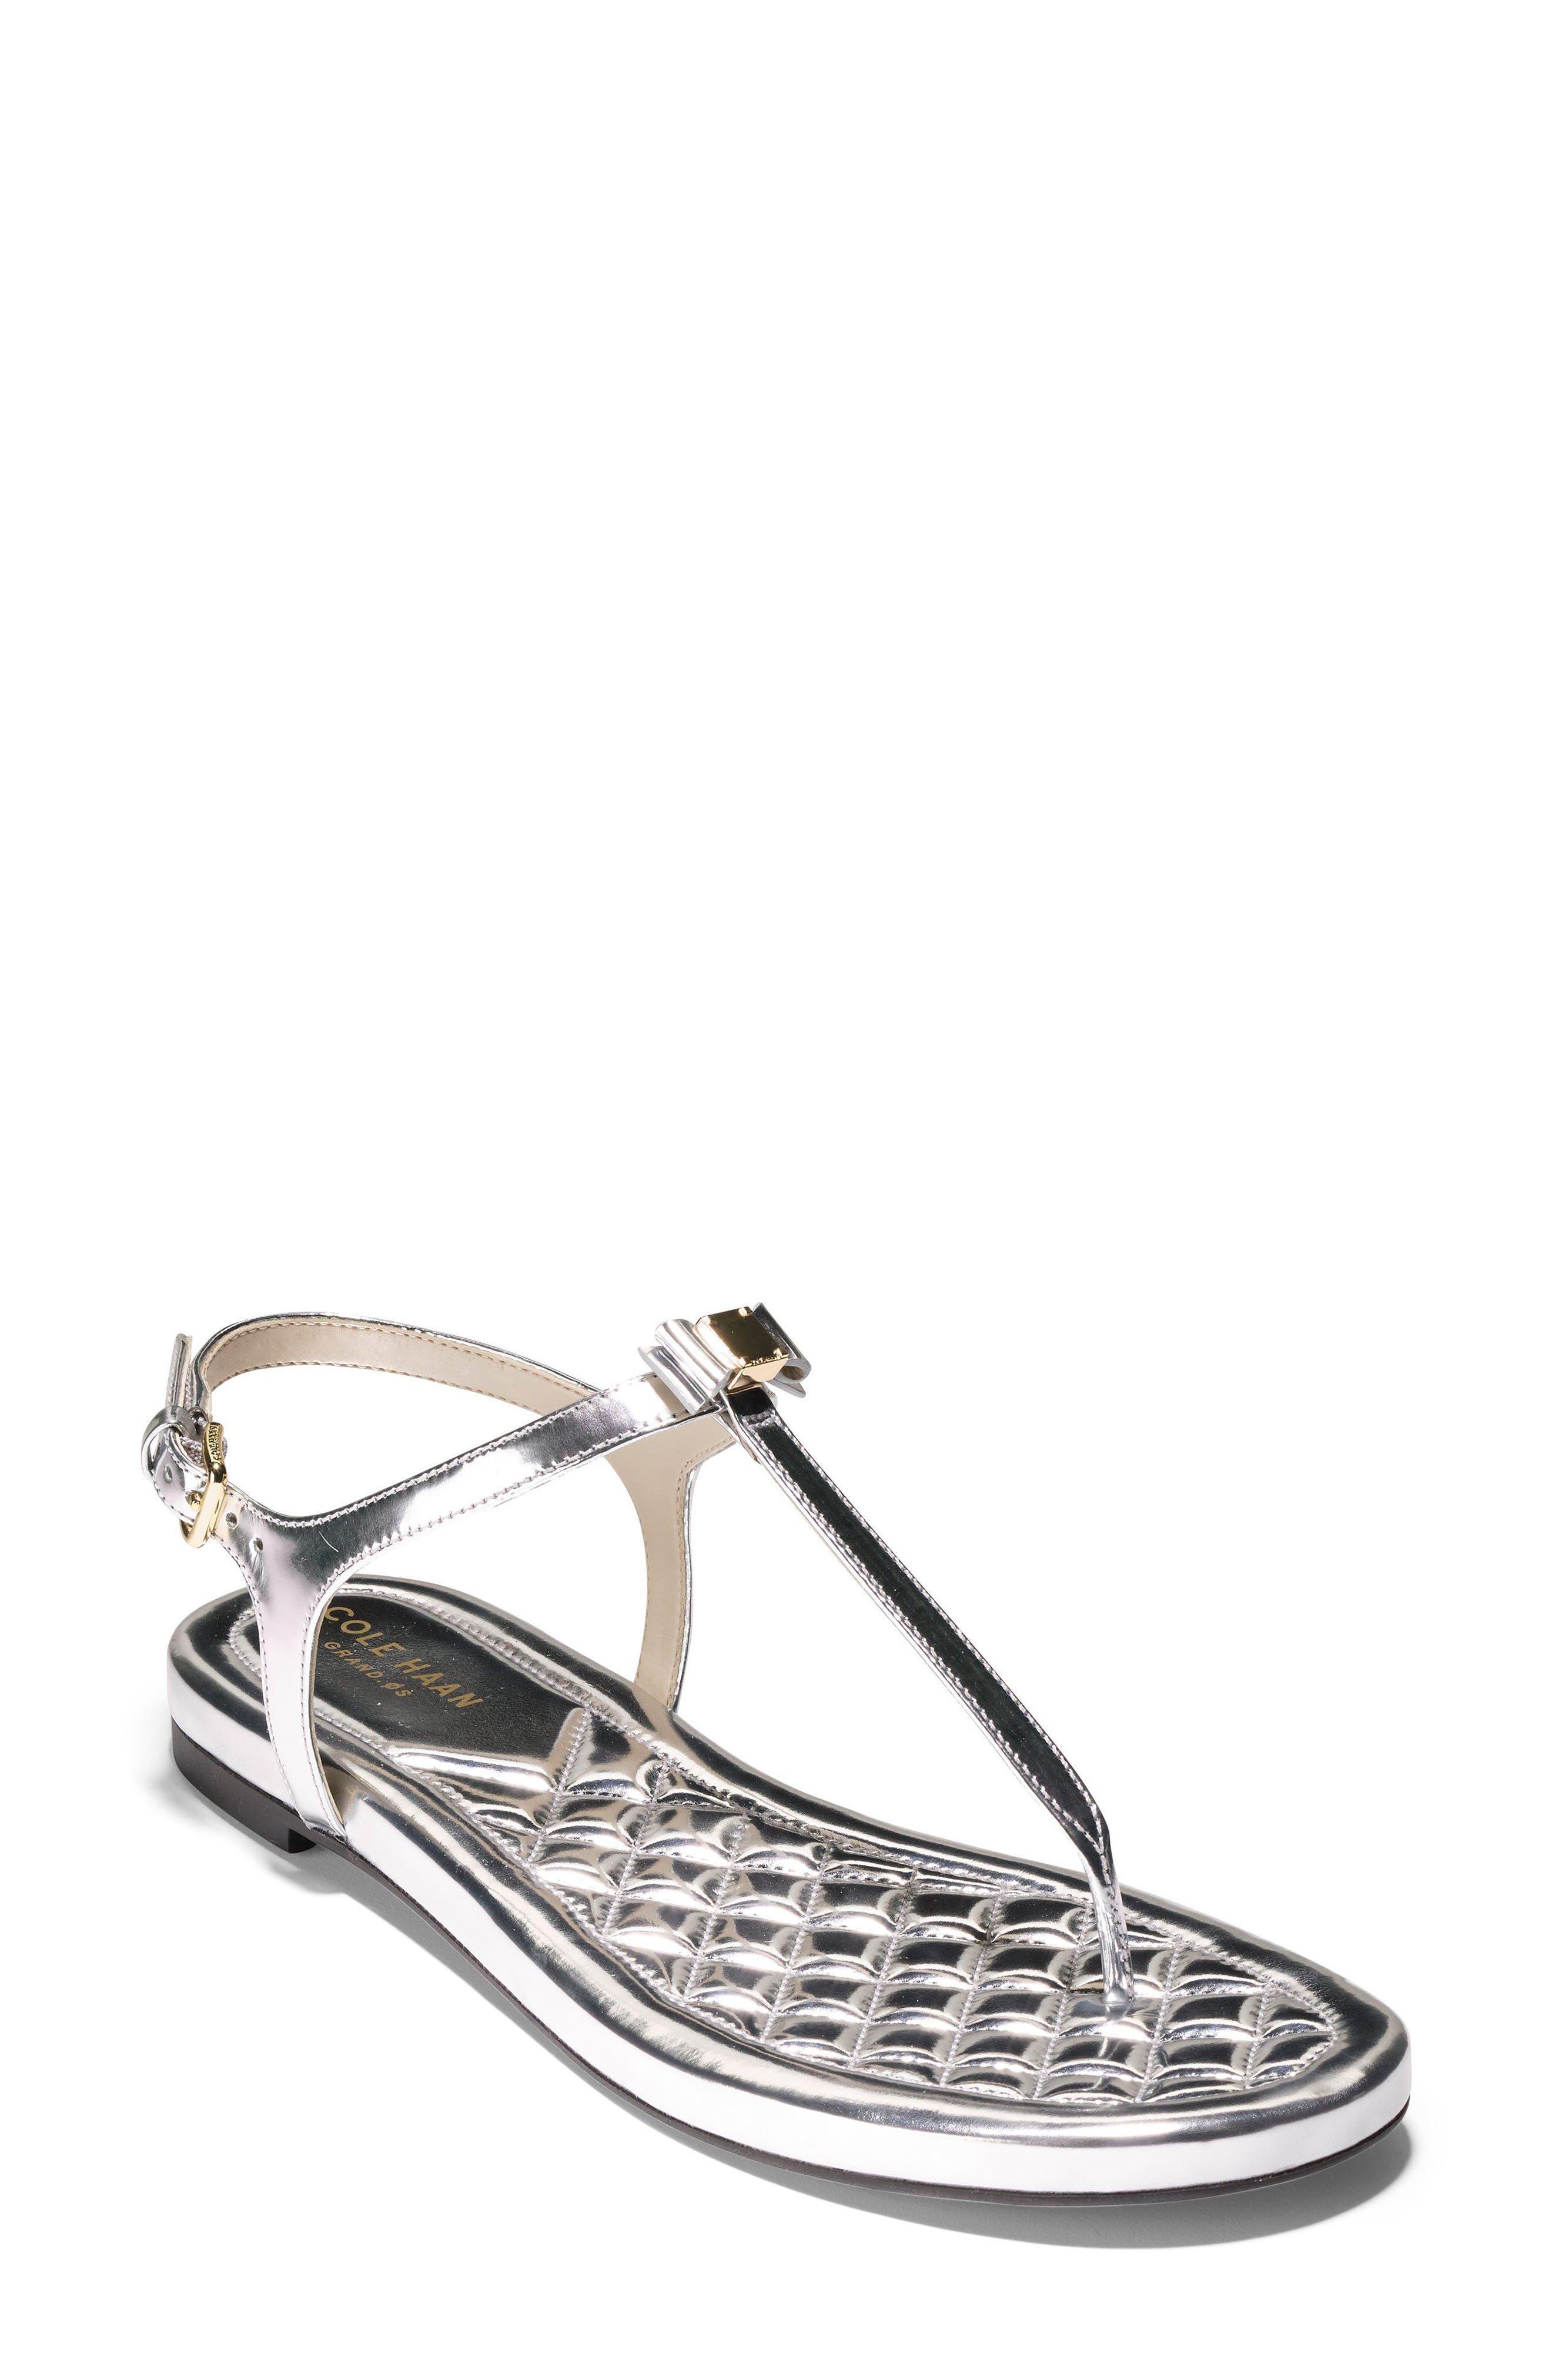 Tali Bow Sandal,                             Main thumbnail 1, color,                             Silver Leather